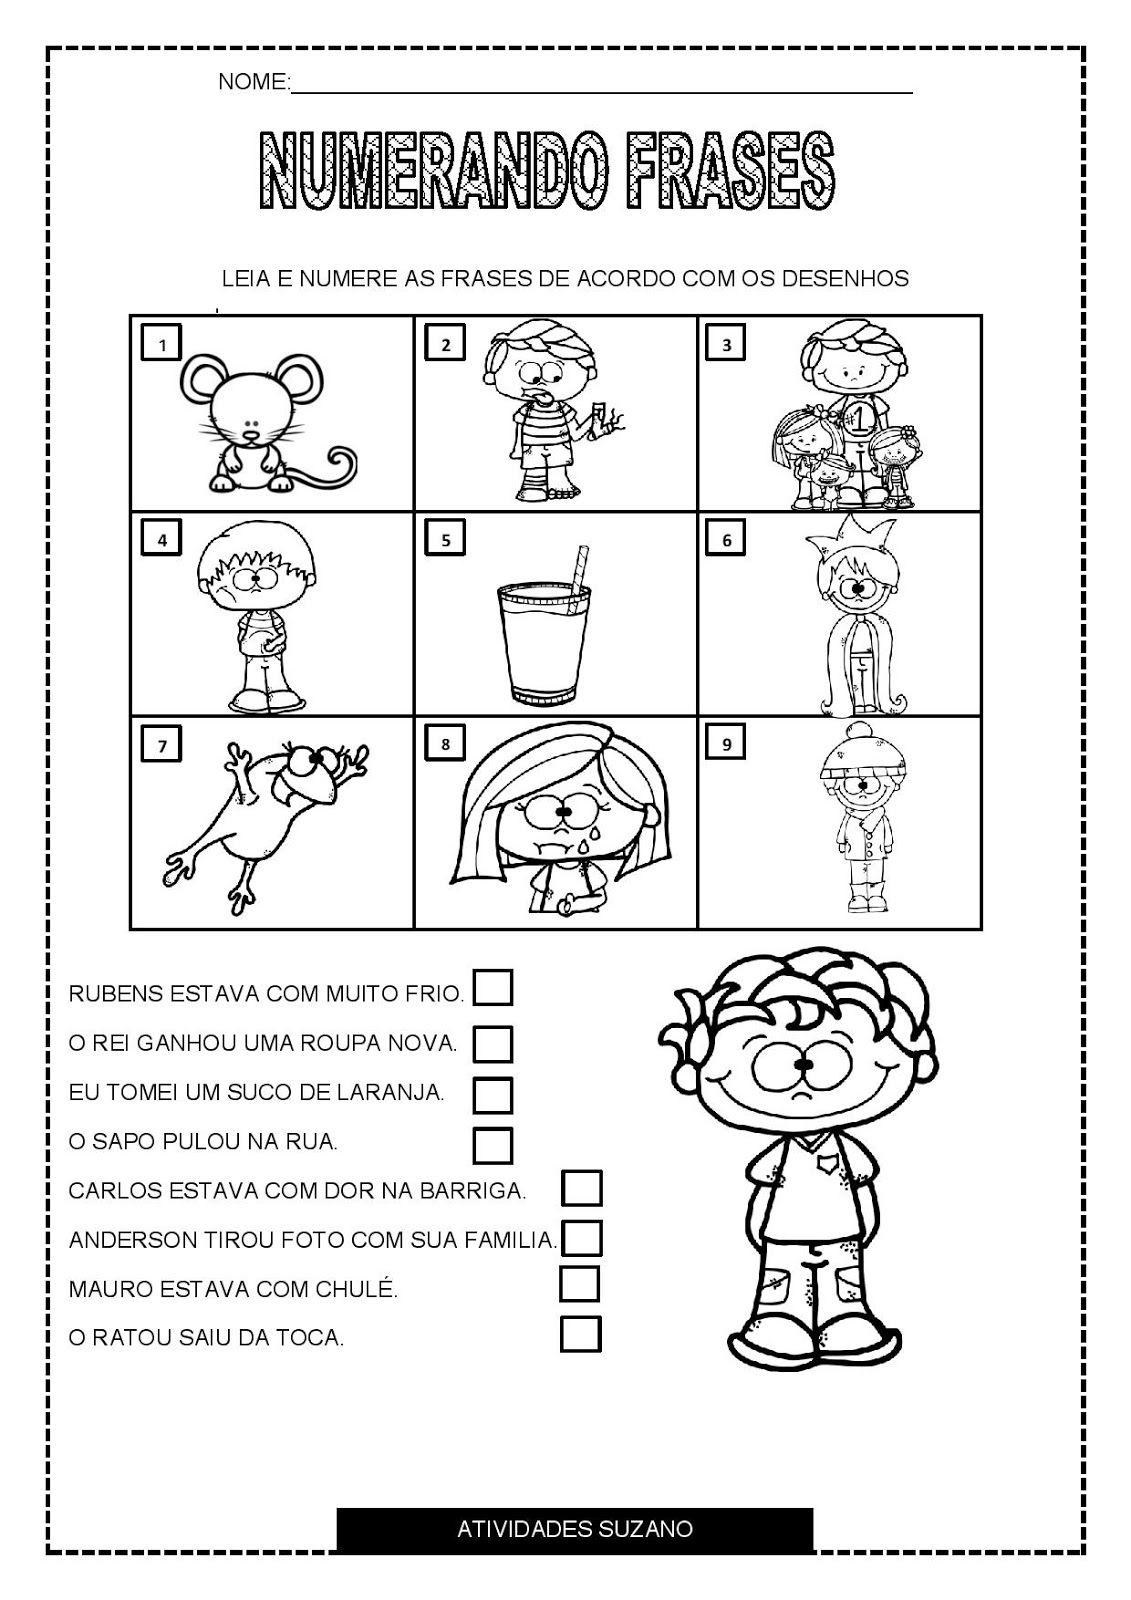 Numerando Frases Actividades Educativas Pinterest Education